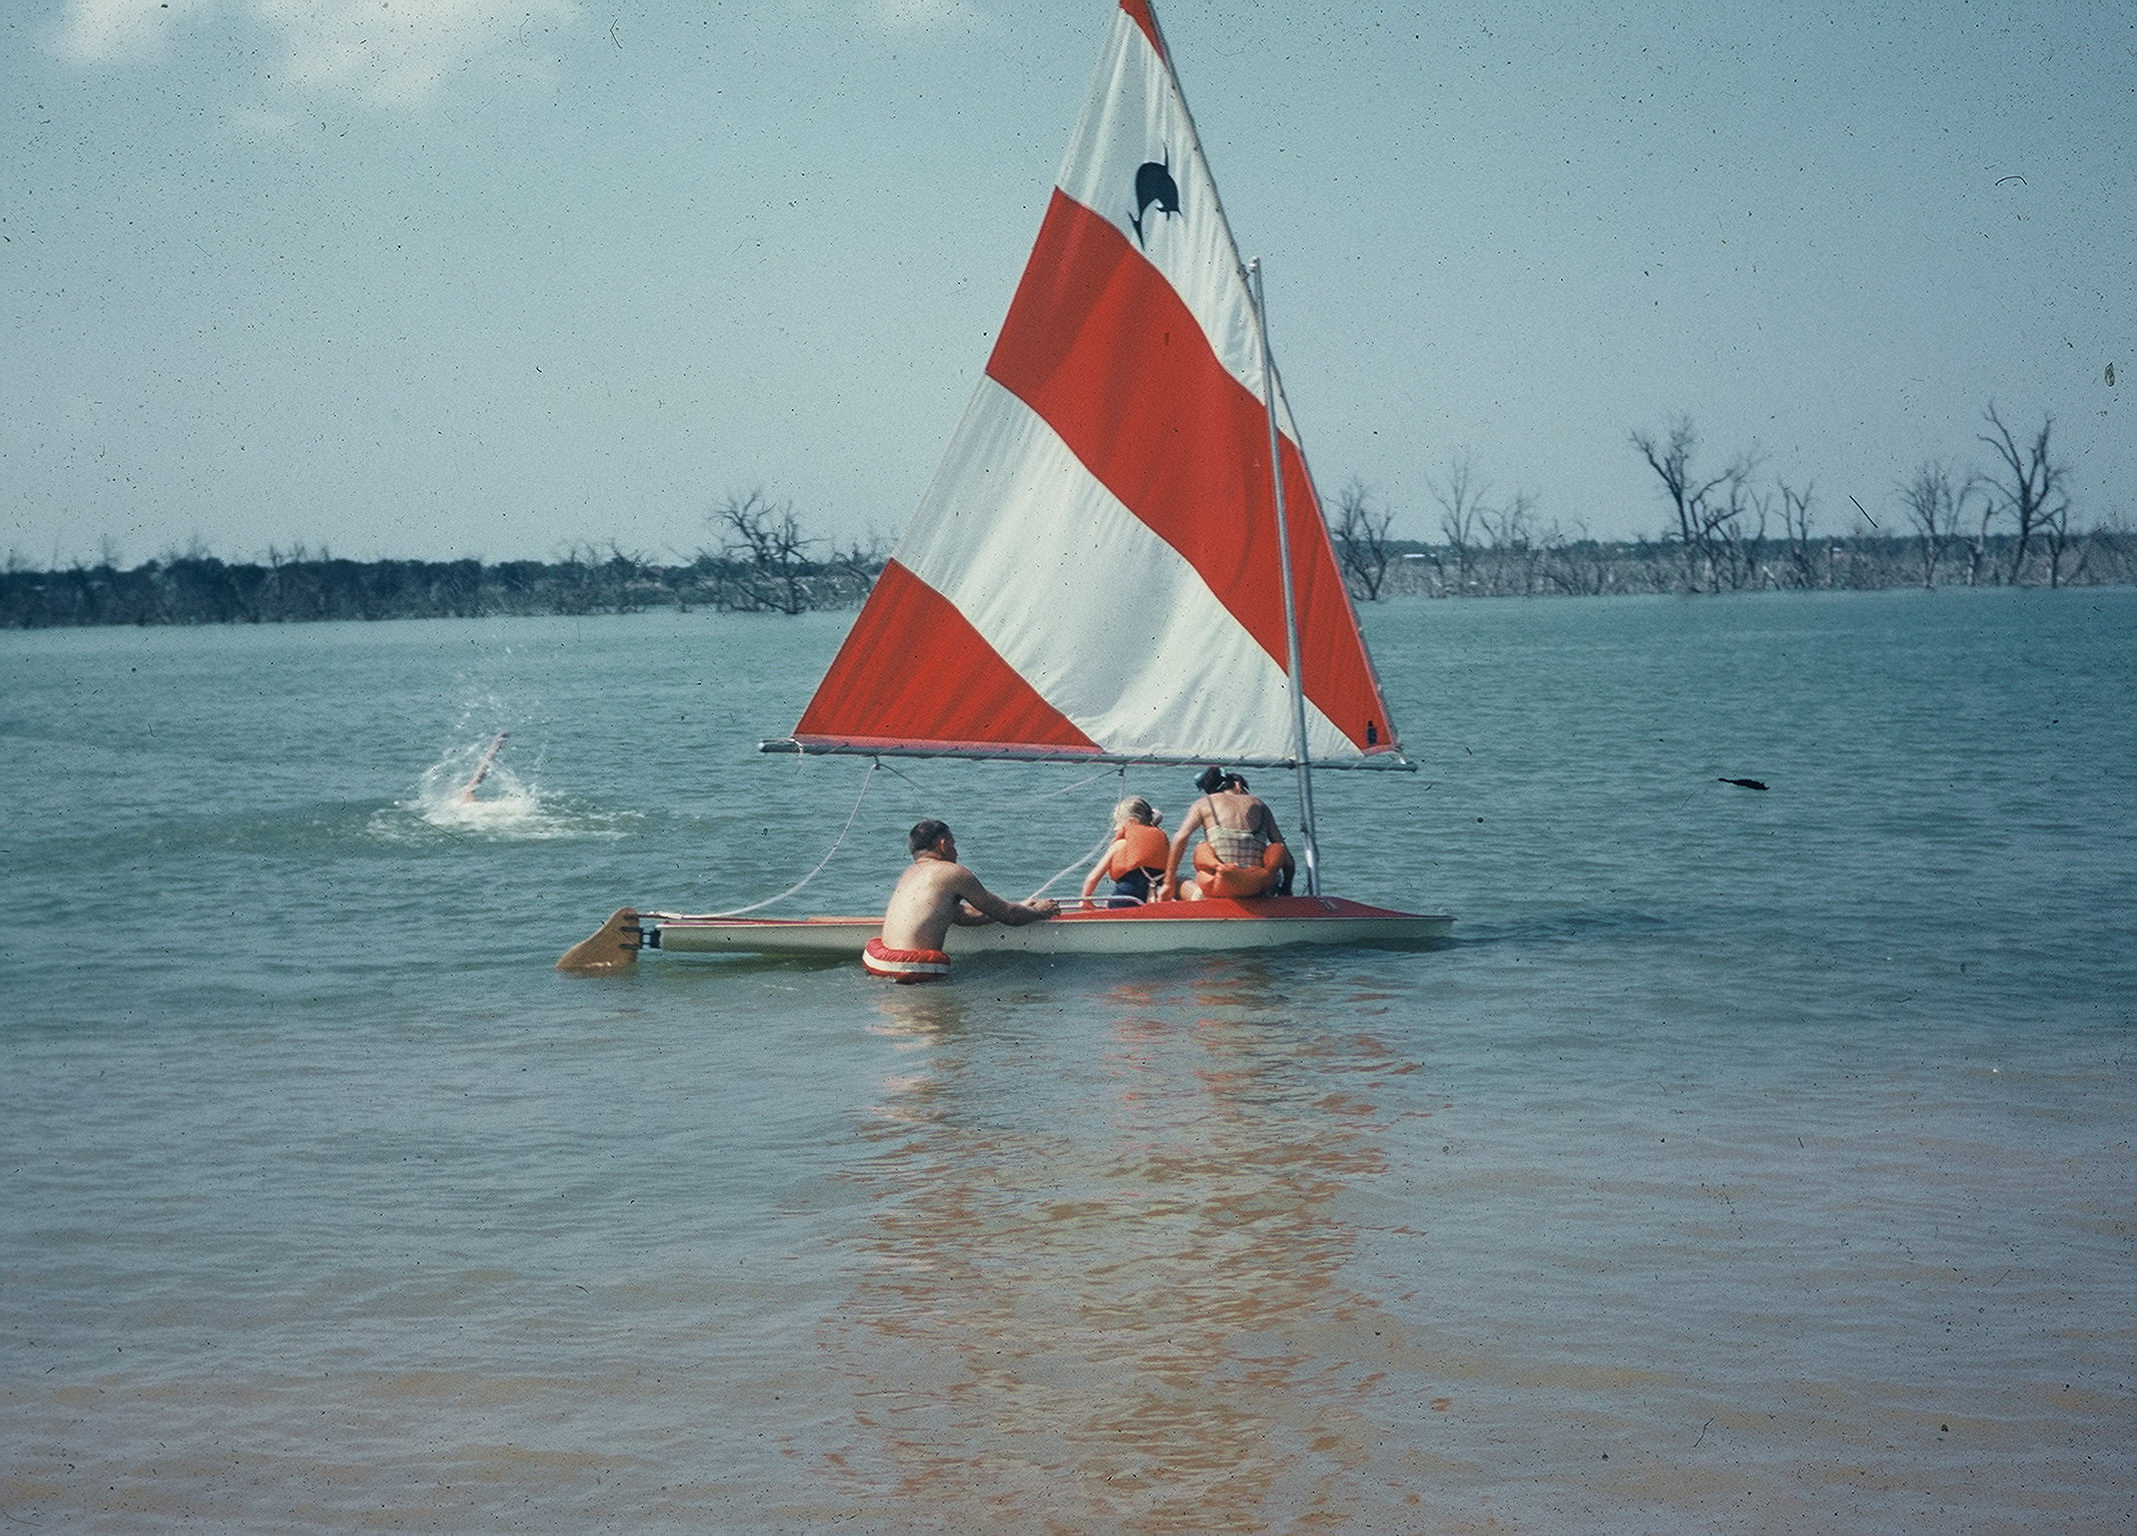 Sailing class Highland Village, Lewisville